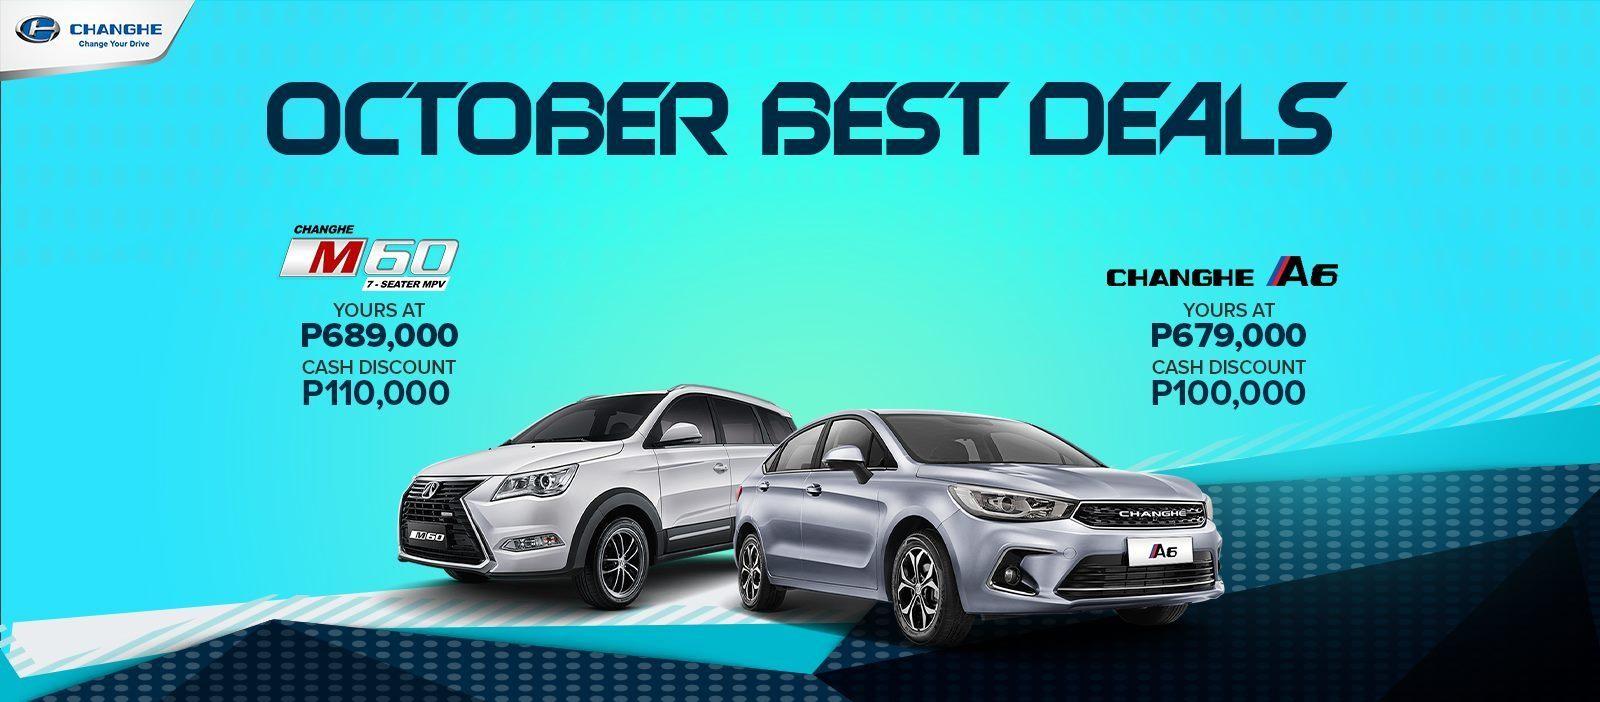 Changhe_October_deals